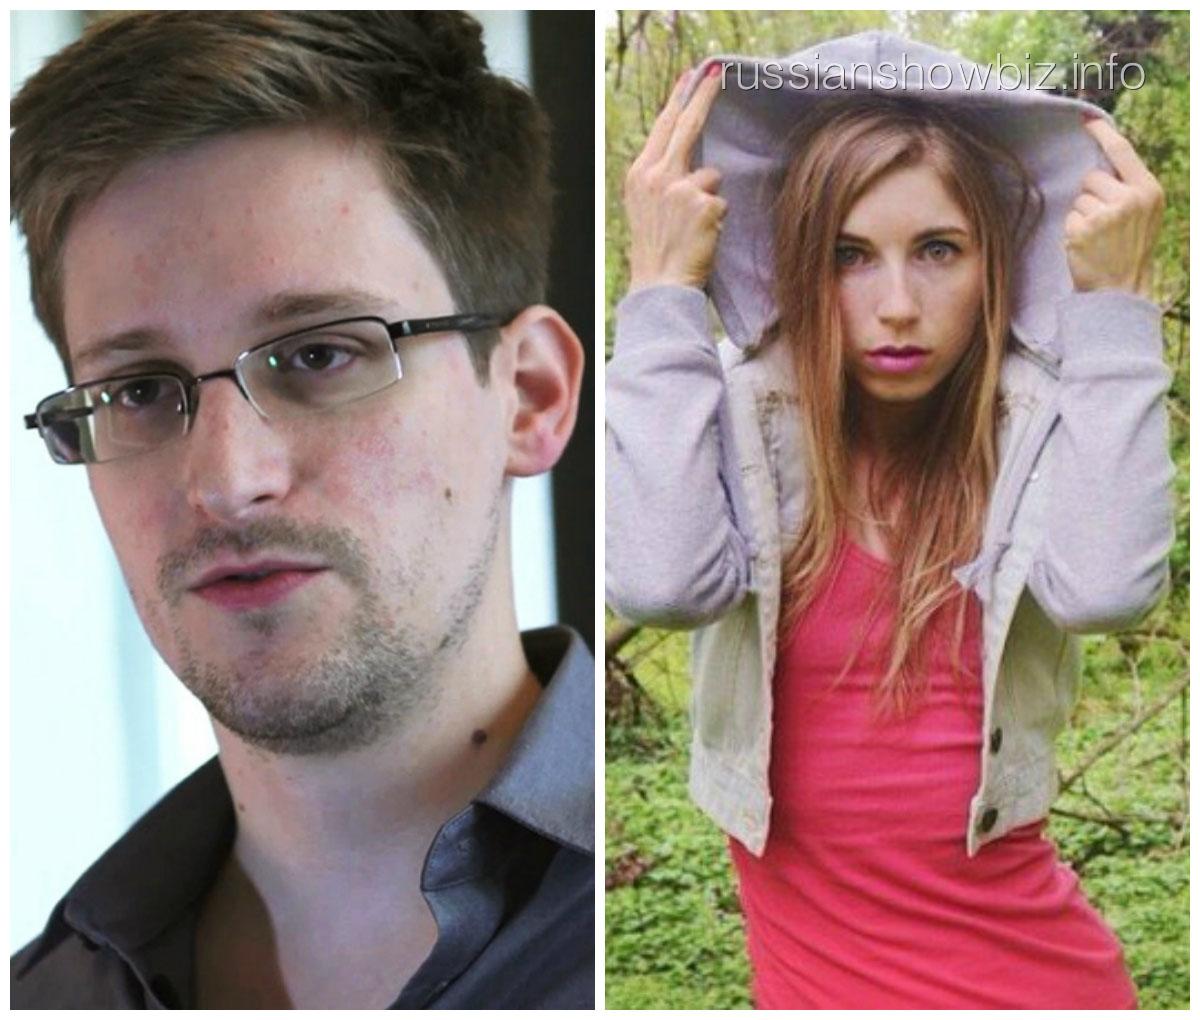 Эдвард Сноуден перевез в Москву свою девушку